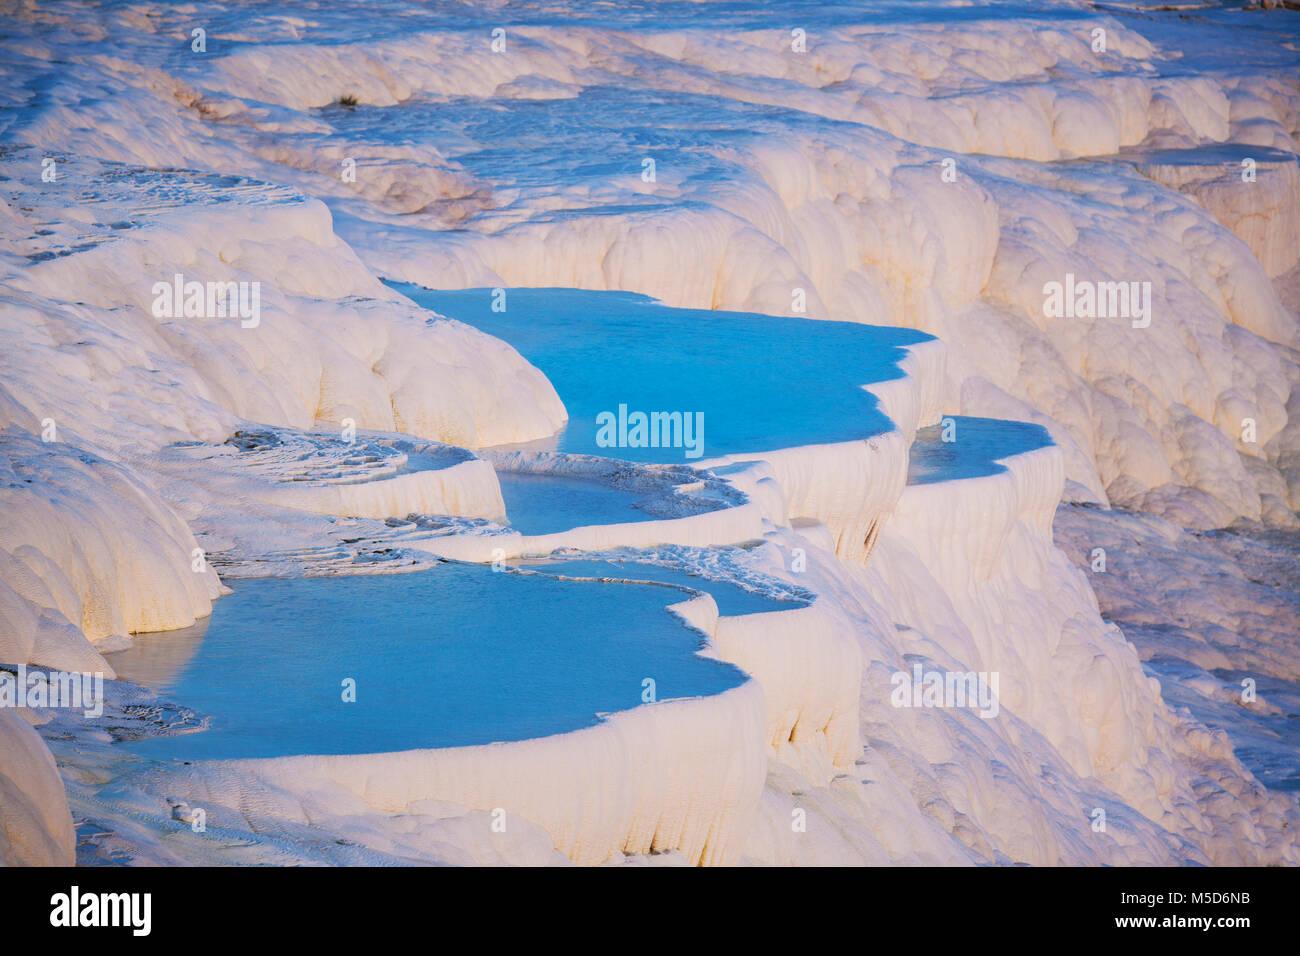 Terraced travertine thermal pools, Pamukkale, UNESCO World Heritage Site, Anatolia, Turkey - Stock Image